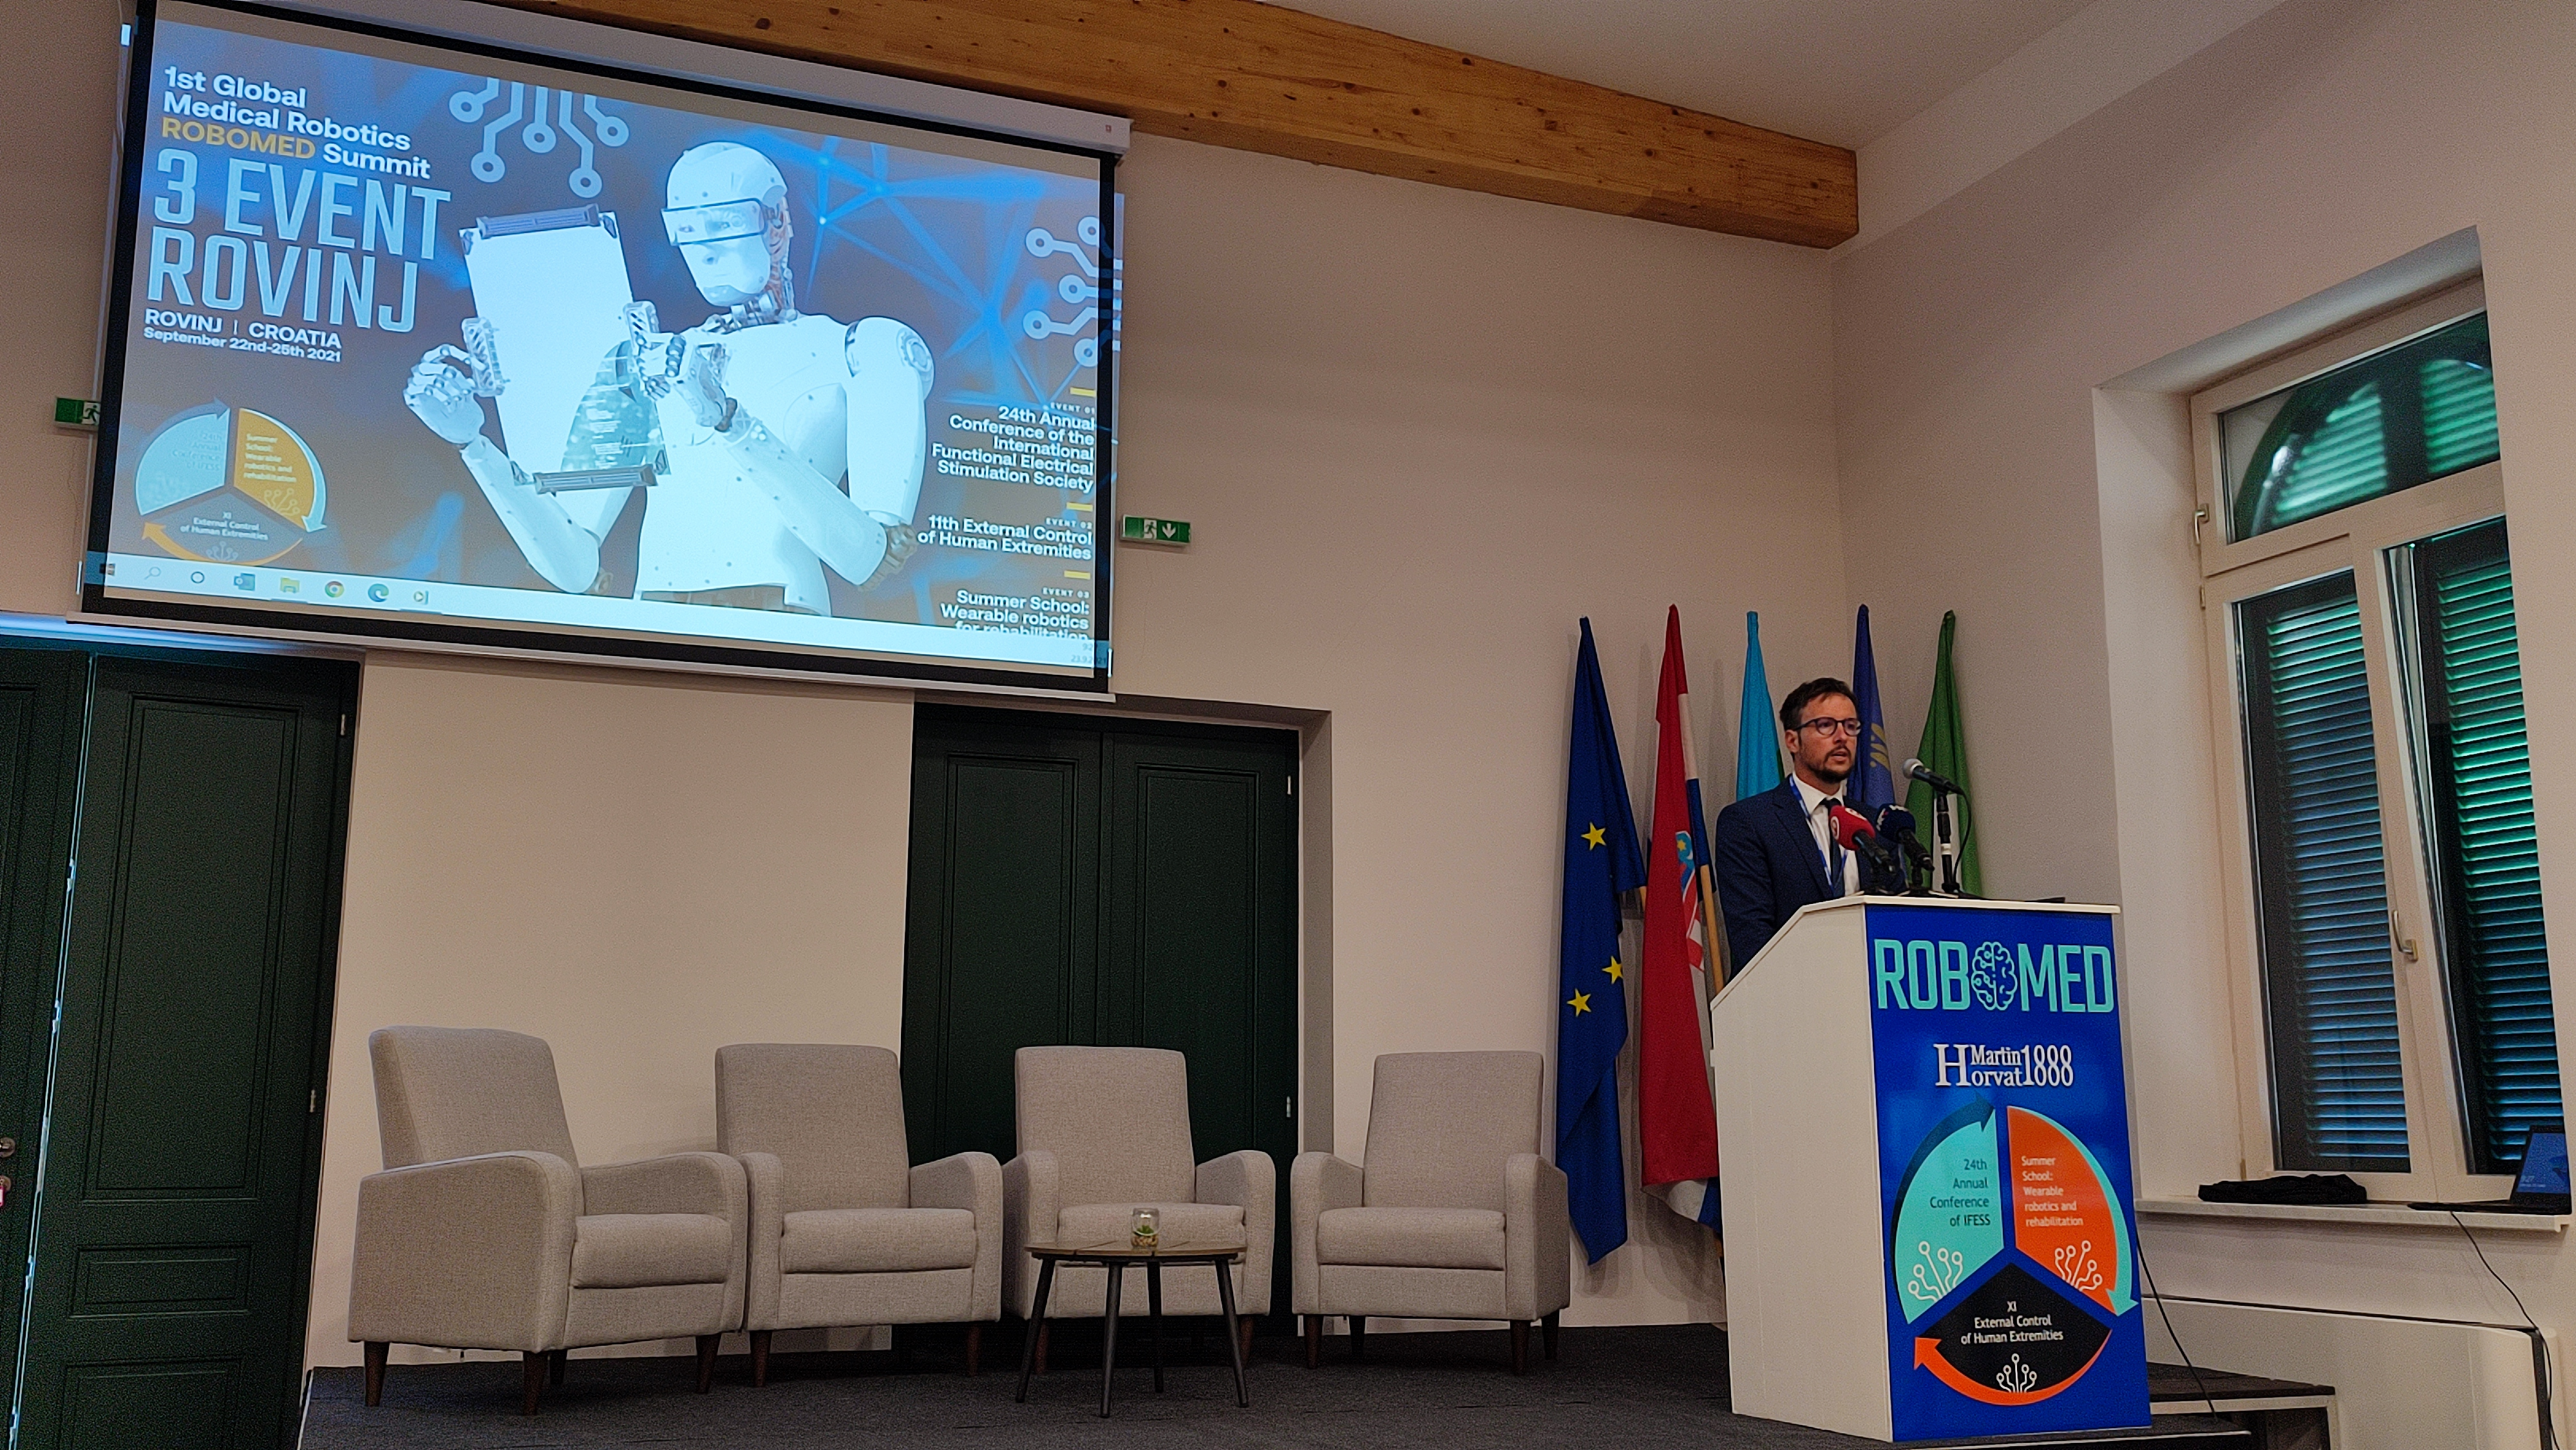 "Specijalna bolnica ""Martin Horvat"" domaćin 1. Globalnog kongresa medicinske robotike"